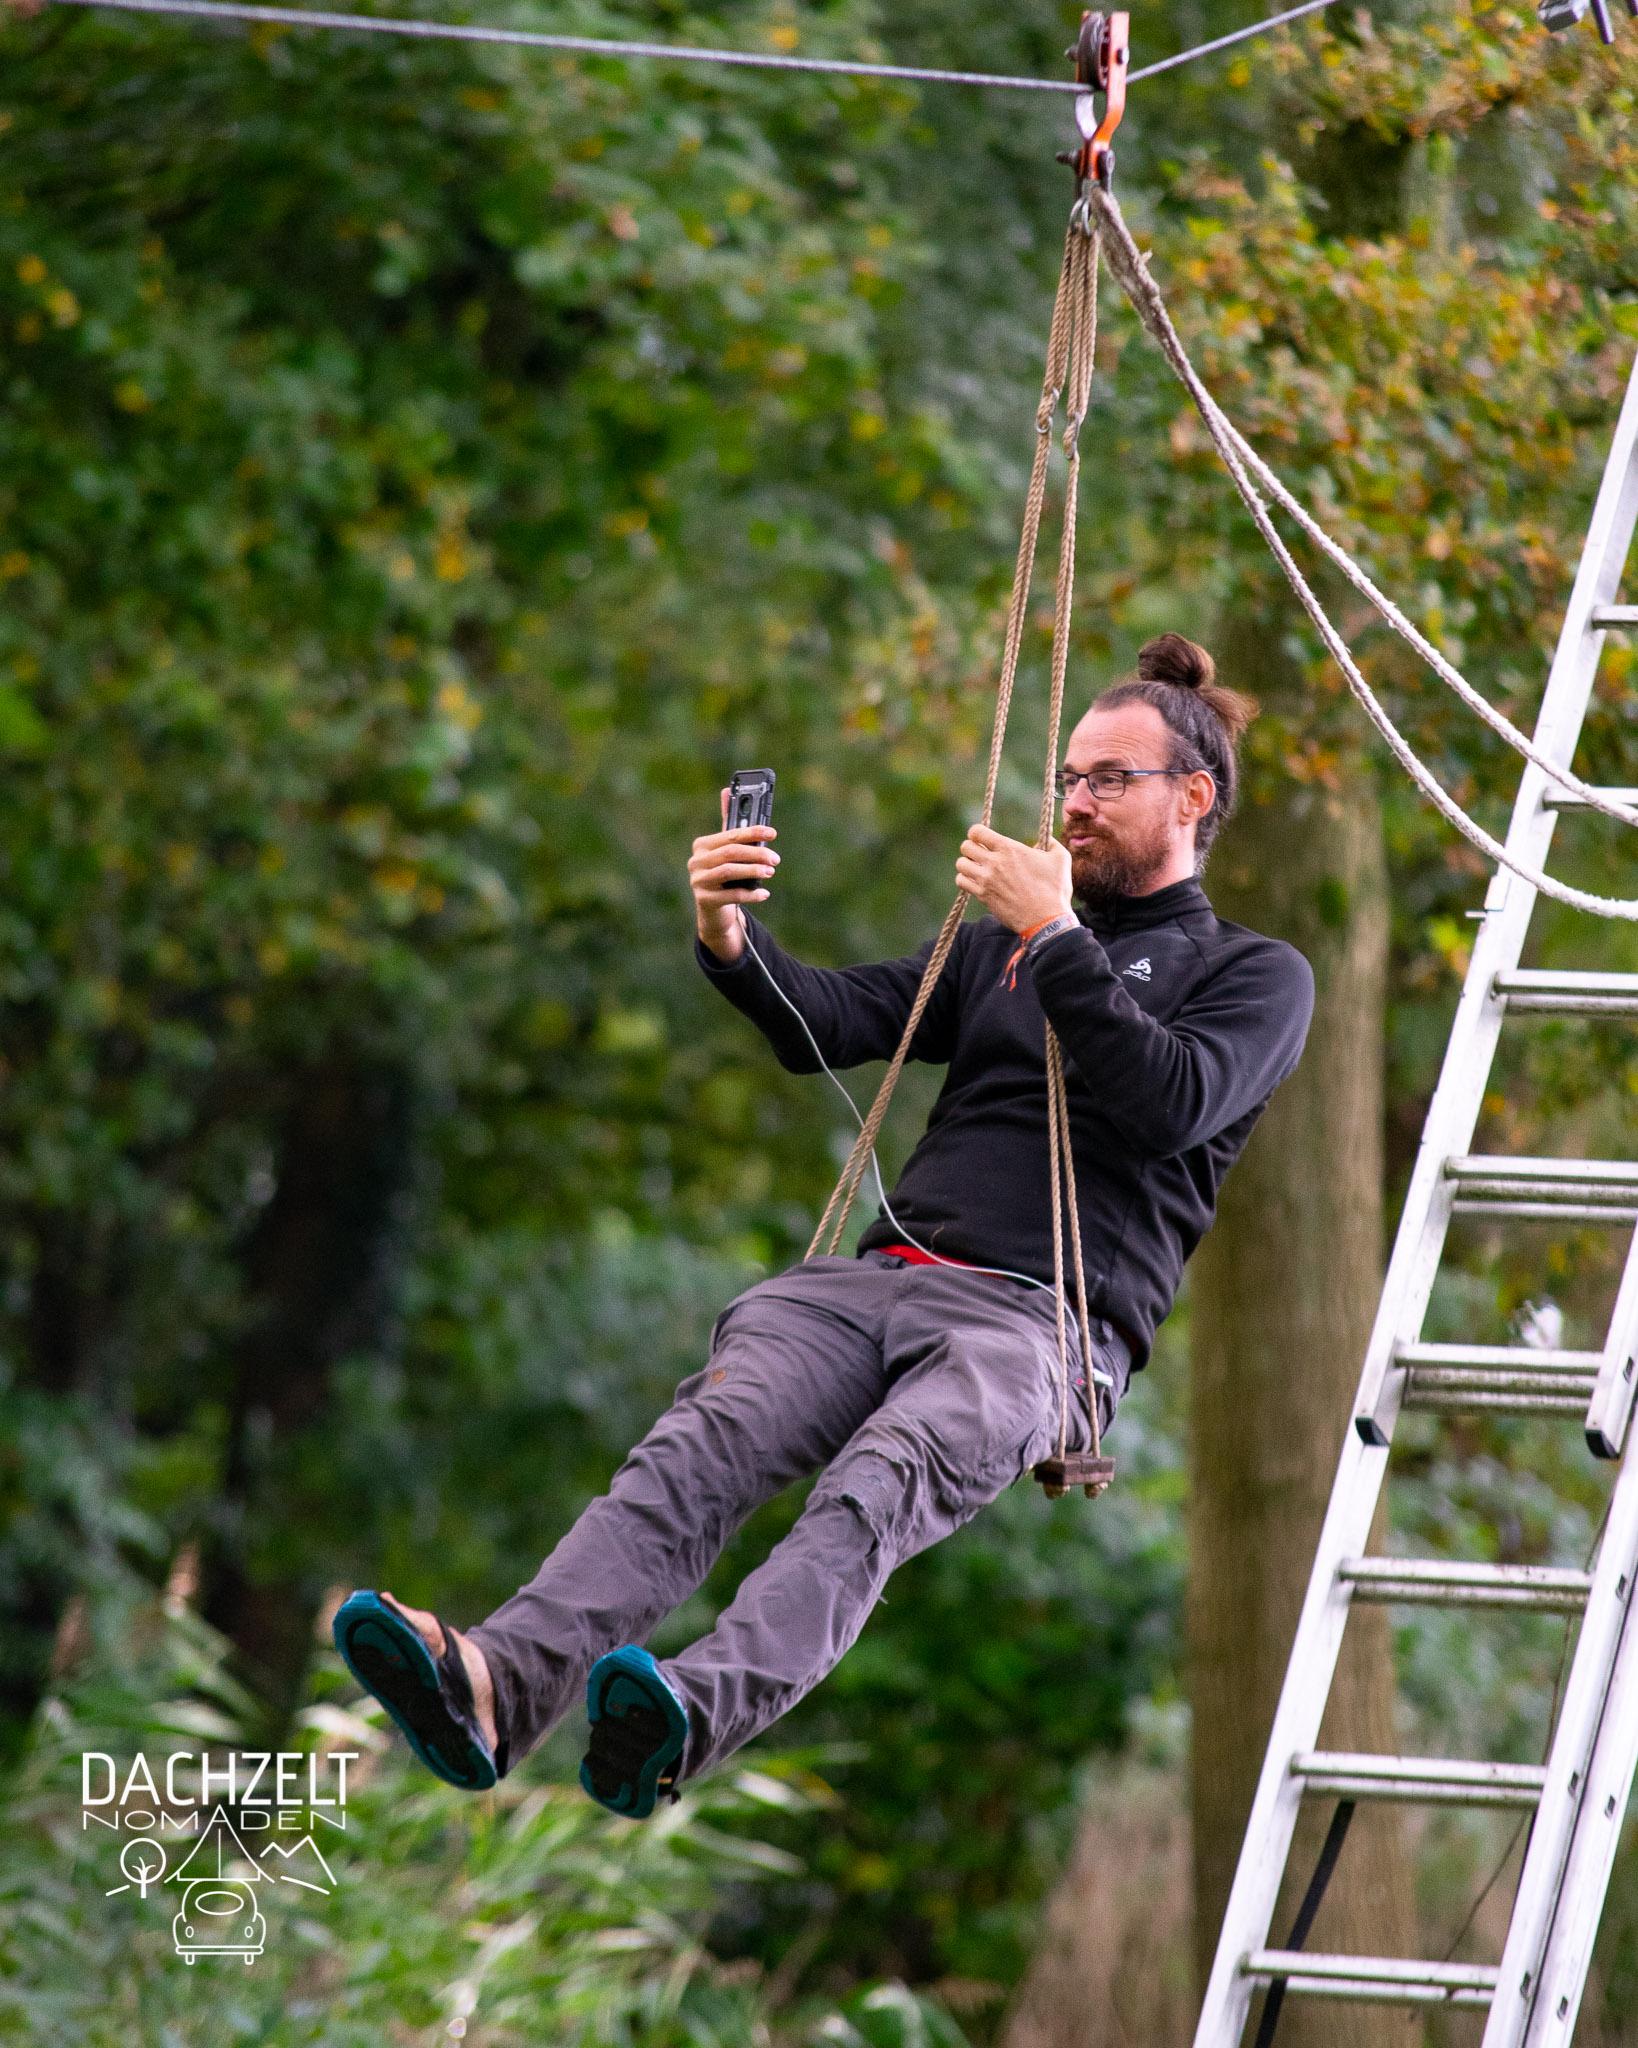 20191018-Dachzelt-Camp-Speciaal-Diana-Schandwinkel-DSC08304